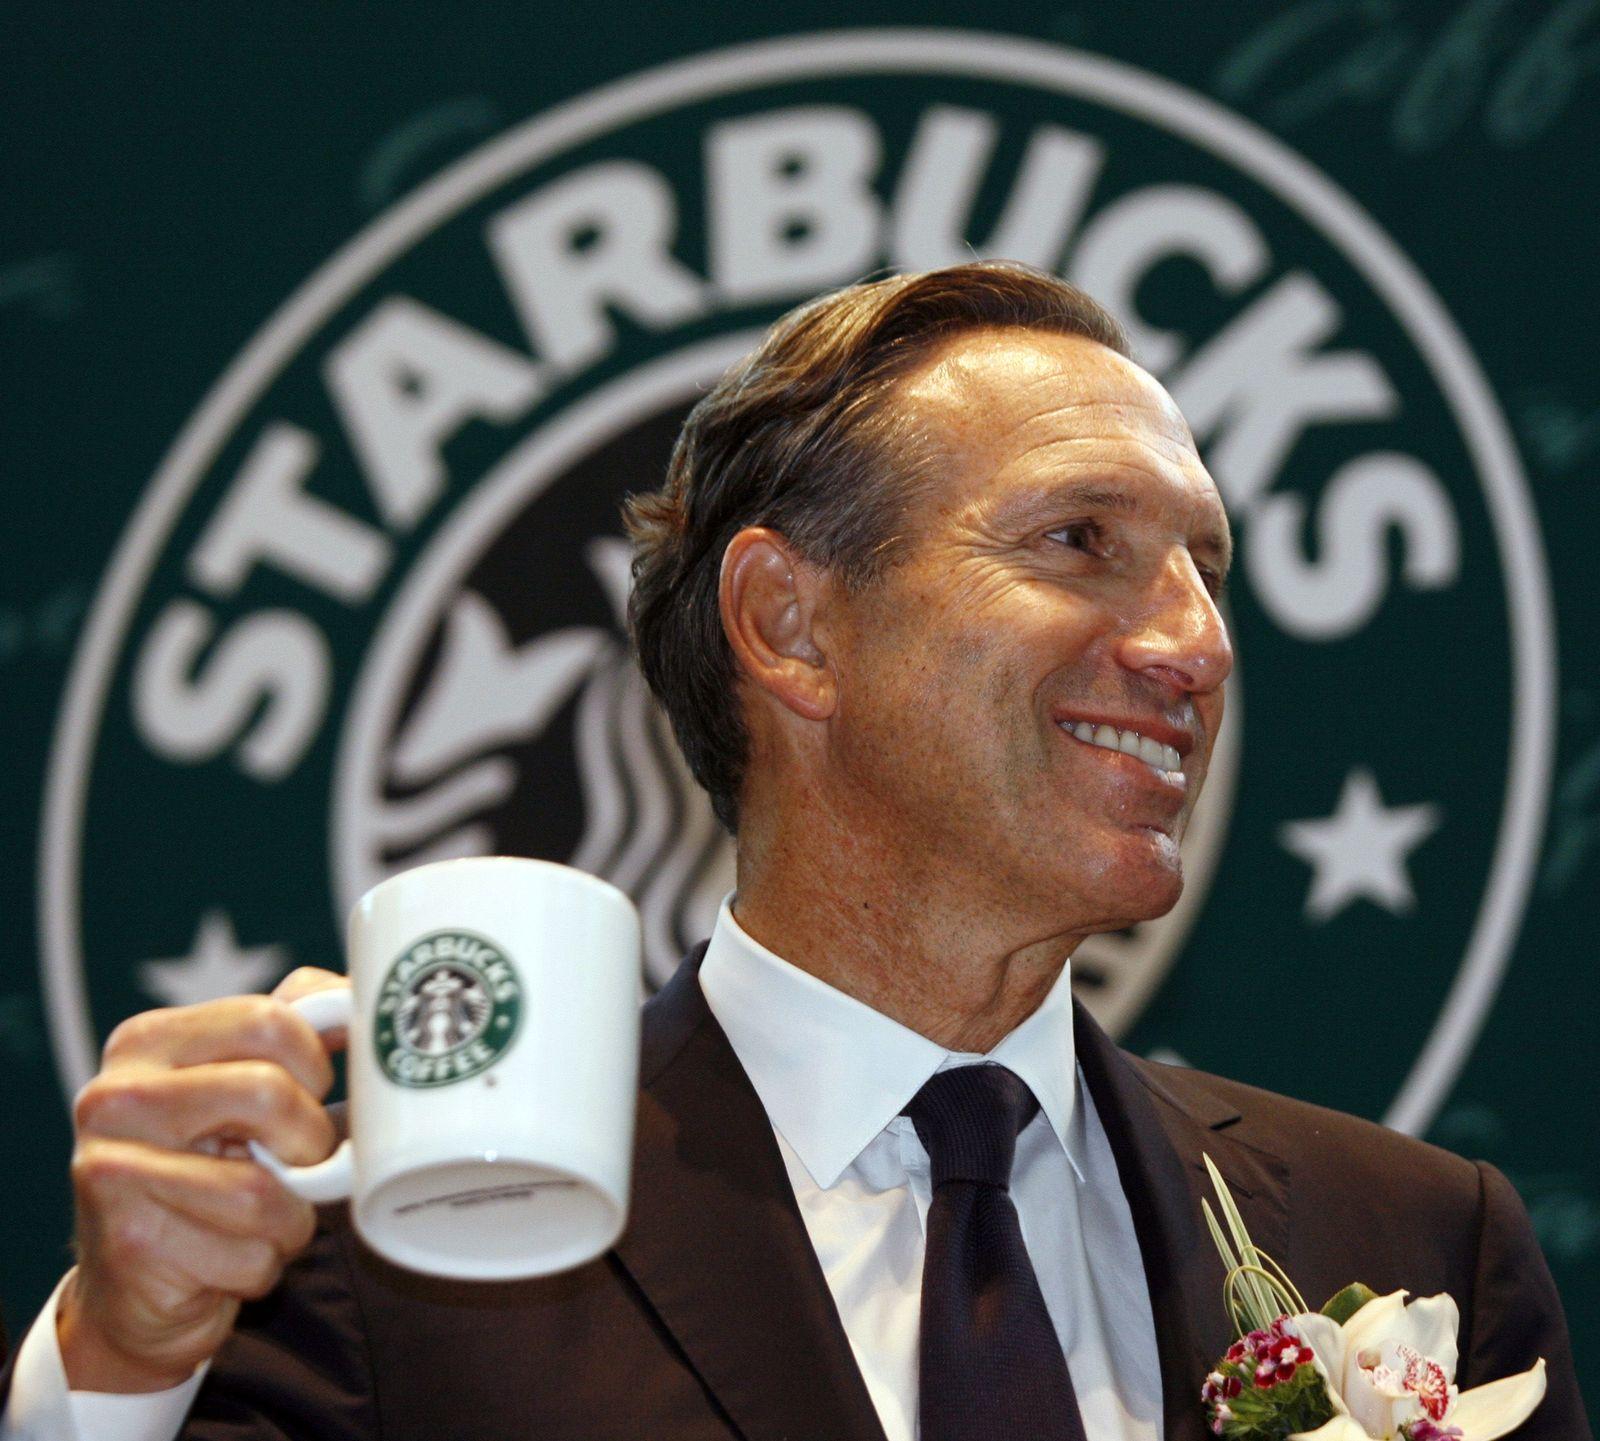 Kaffee / Starbucks / Howard Schultz